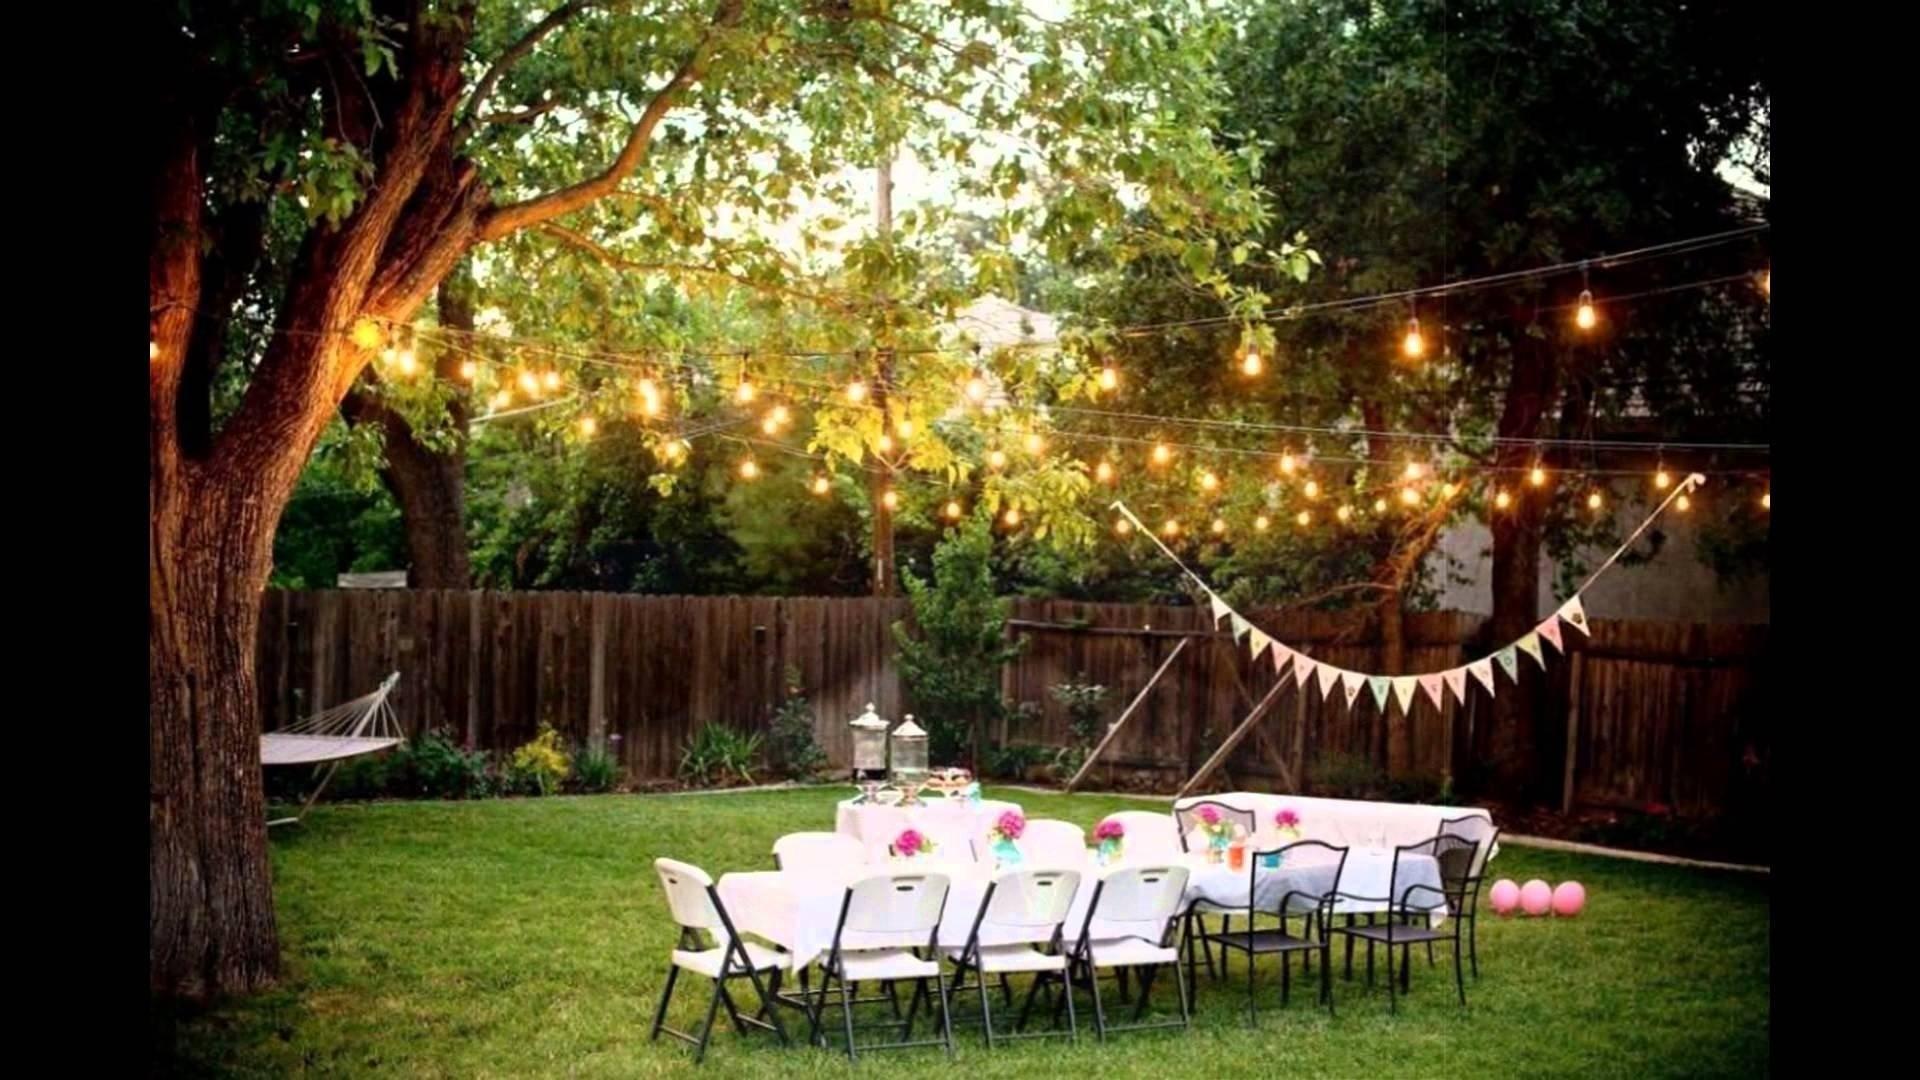 10 Stylish Outside Wedding Ideas For Summer backyard weddings on a budget youtube 4